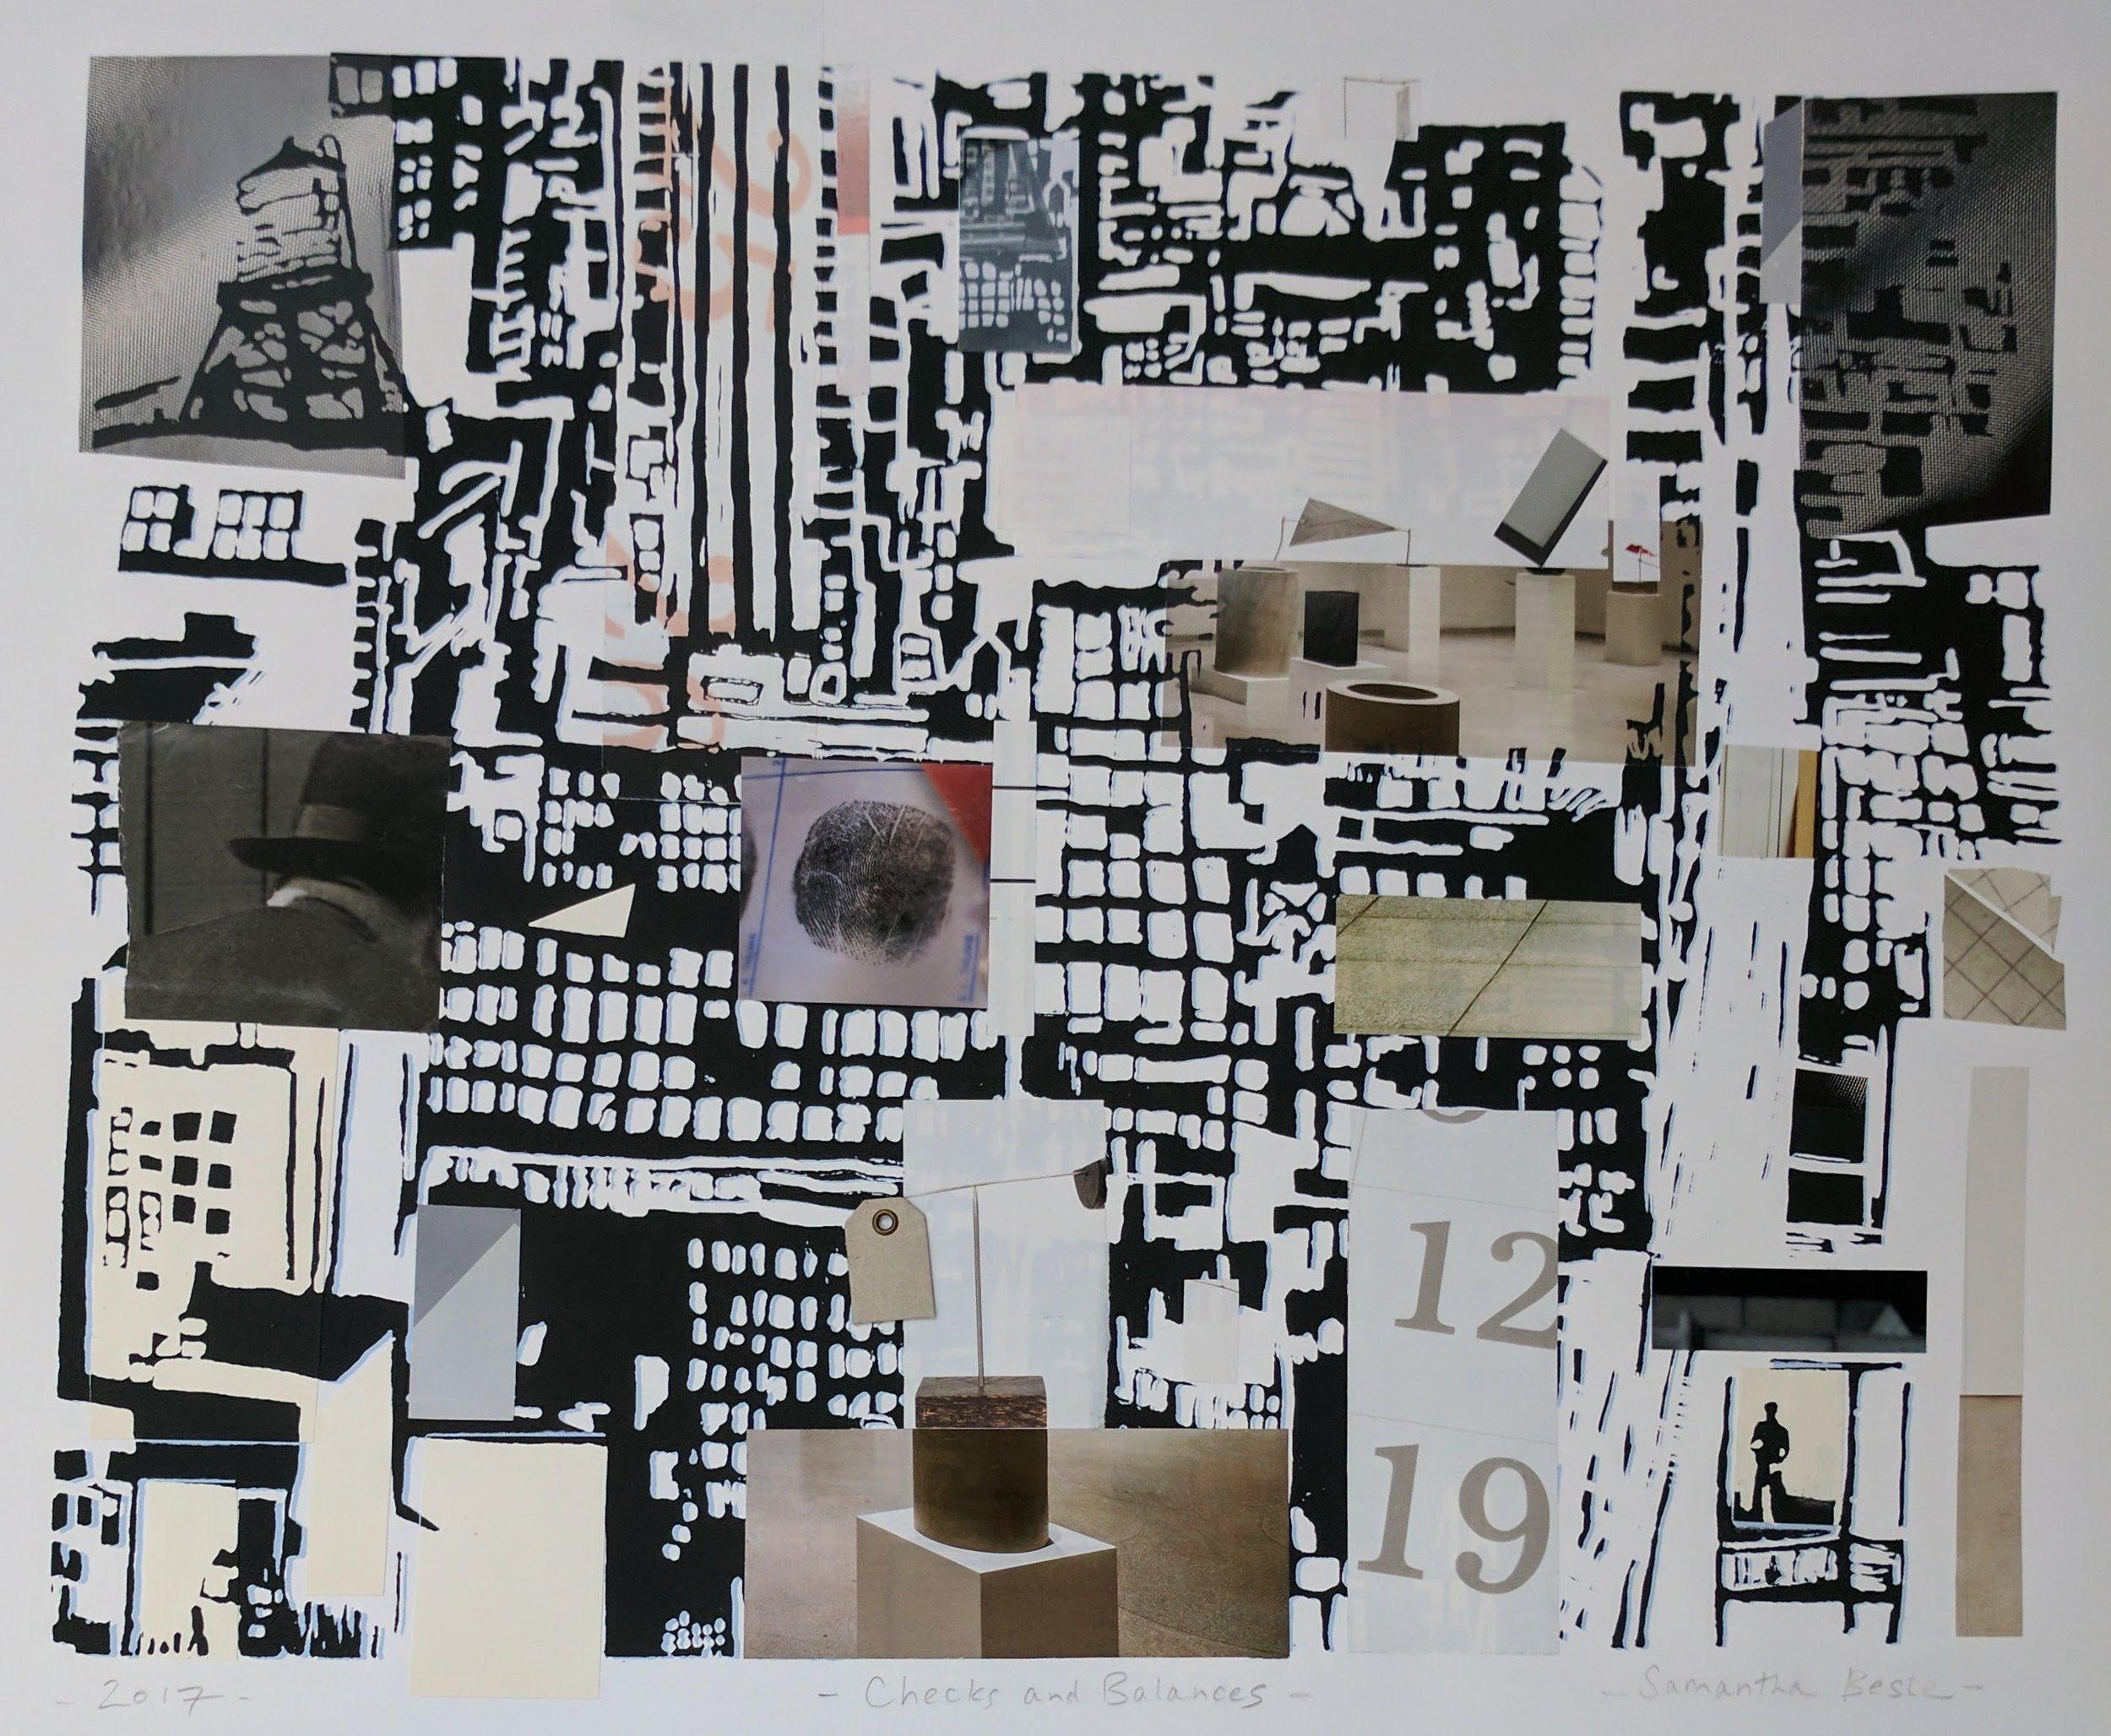 """Checks and Balances"", serigraph/collage, 28""x 22"", 2017"